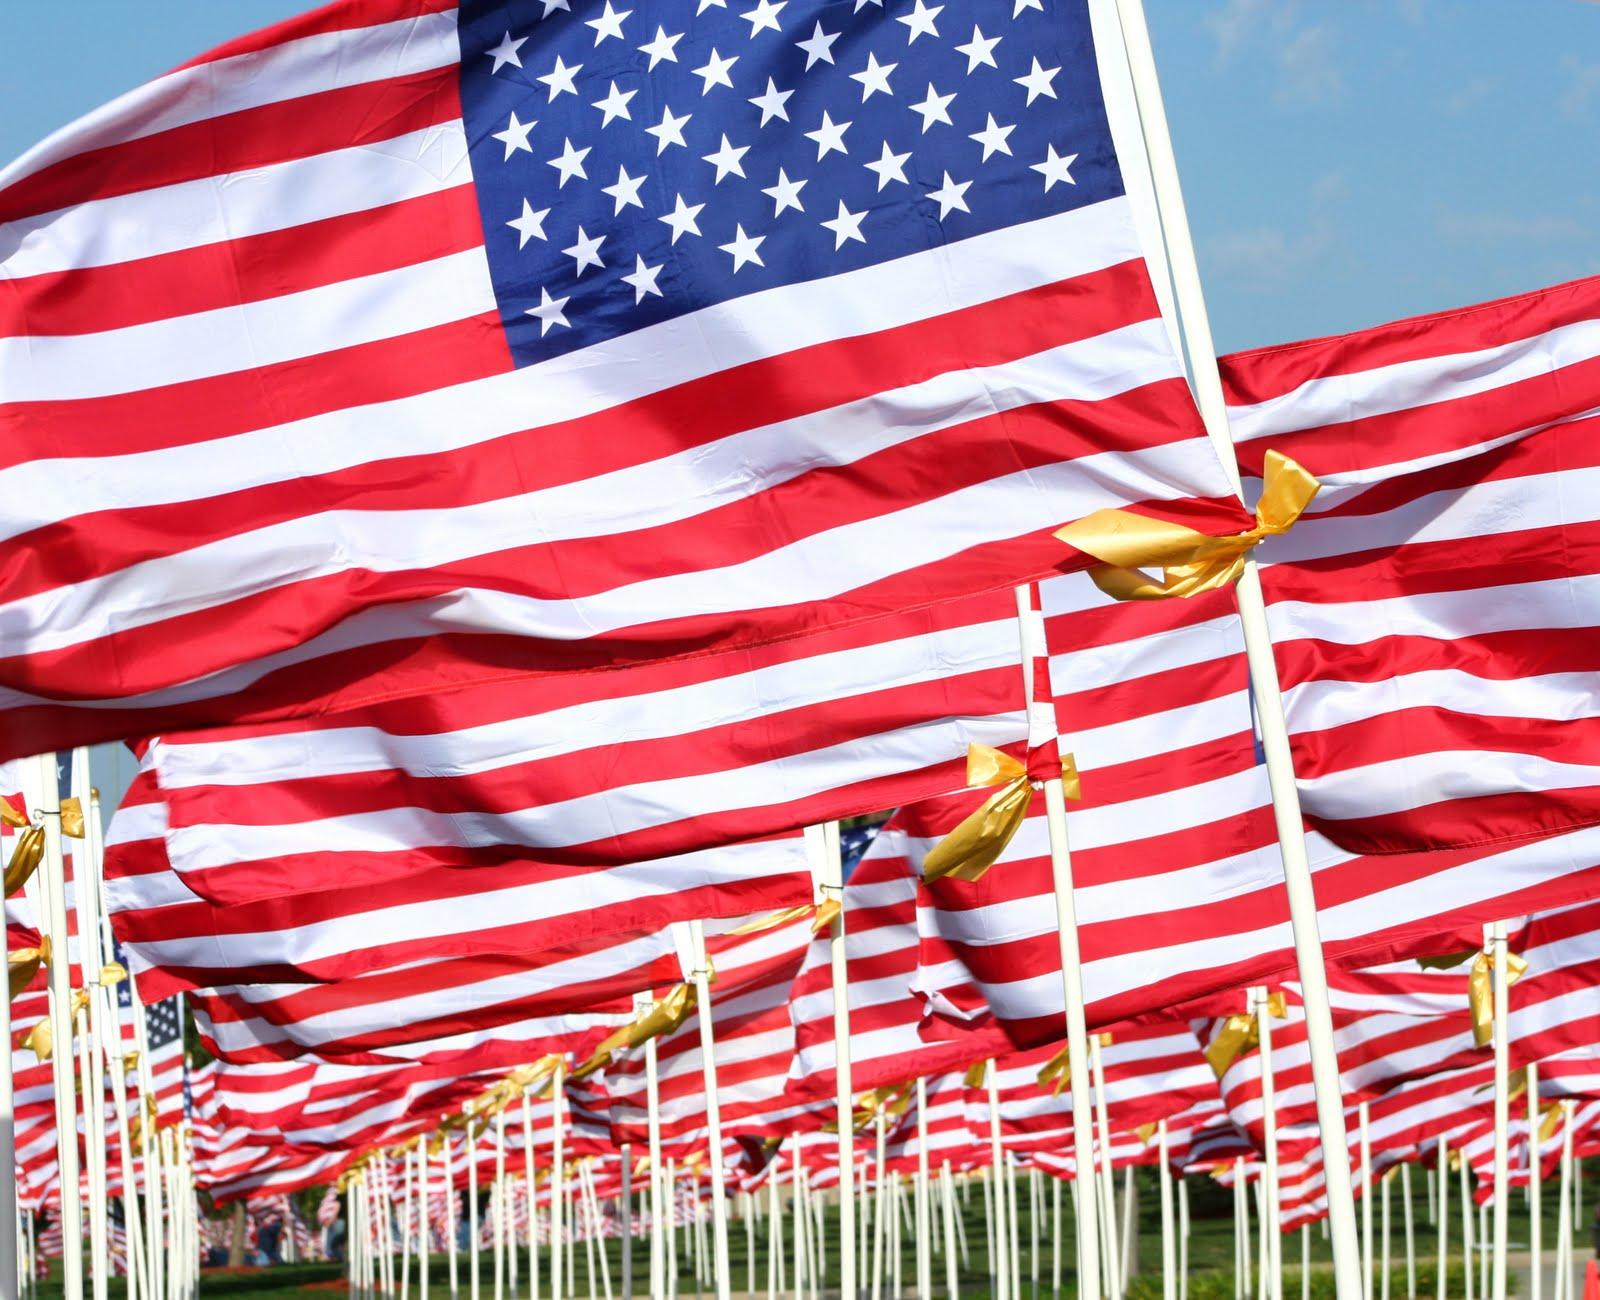 essay on patriotism patriotic essay high school essay how to write  patriotic essay terra rubra lions club american heritage patriotic essay contest